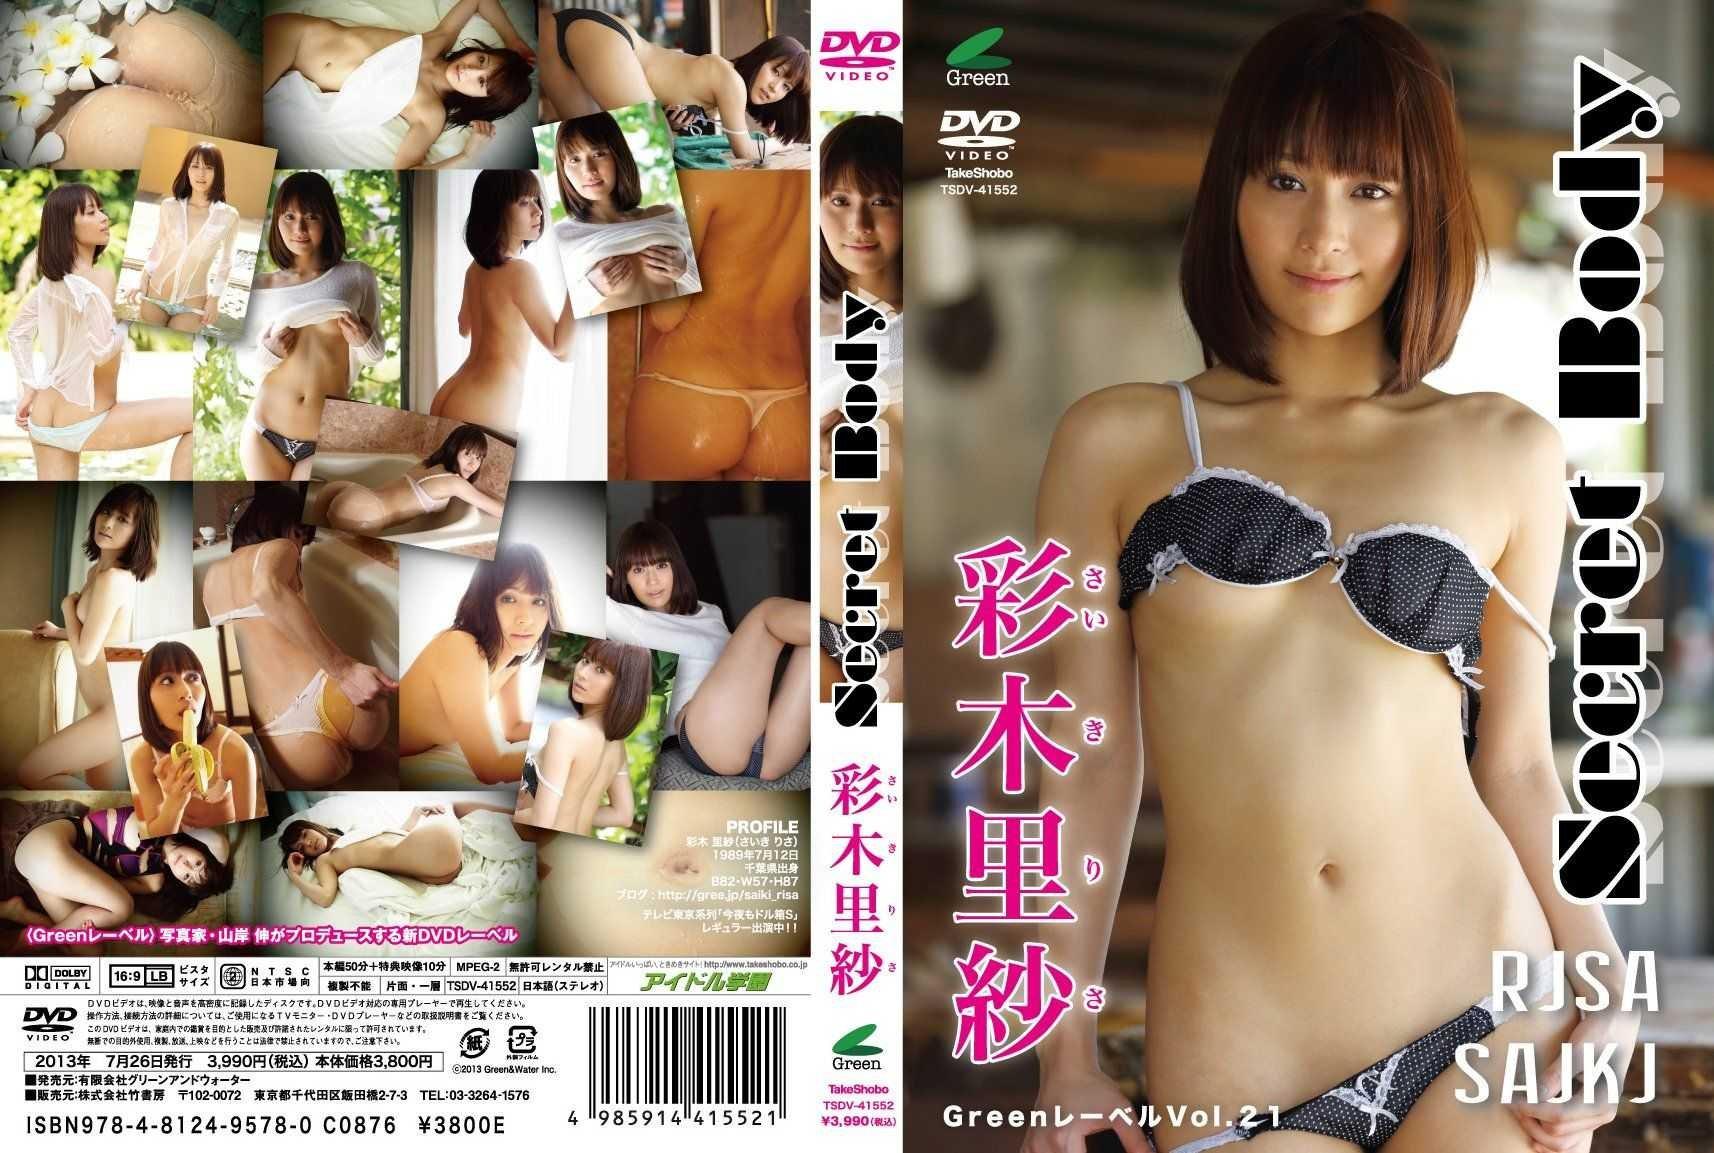 Risa Saiki - Secret Body Vol-21